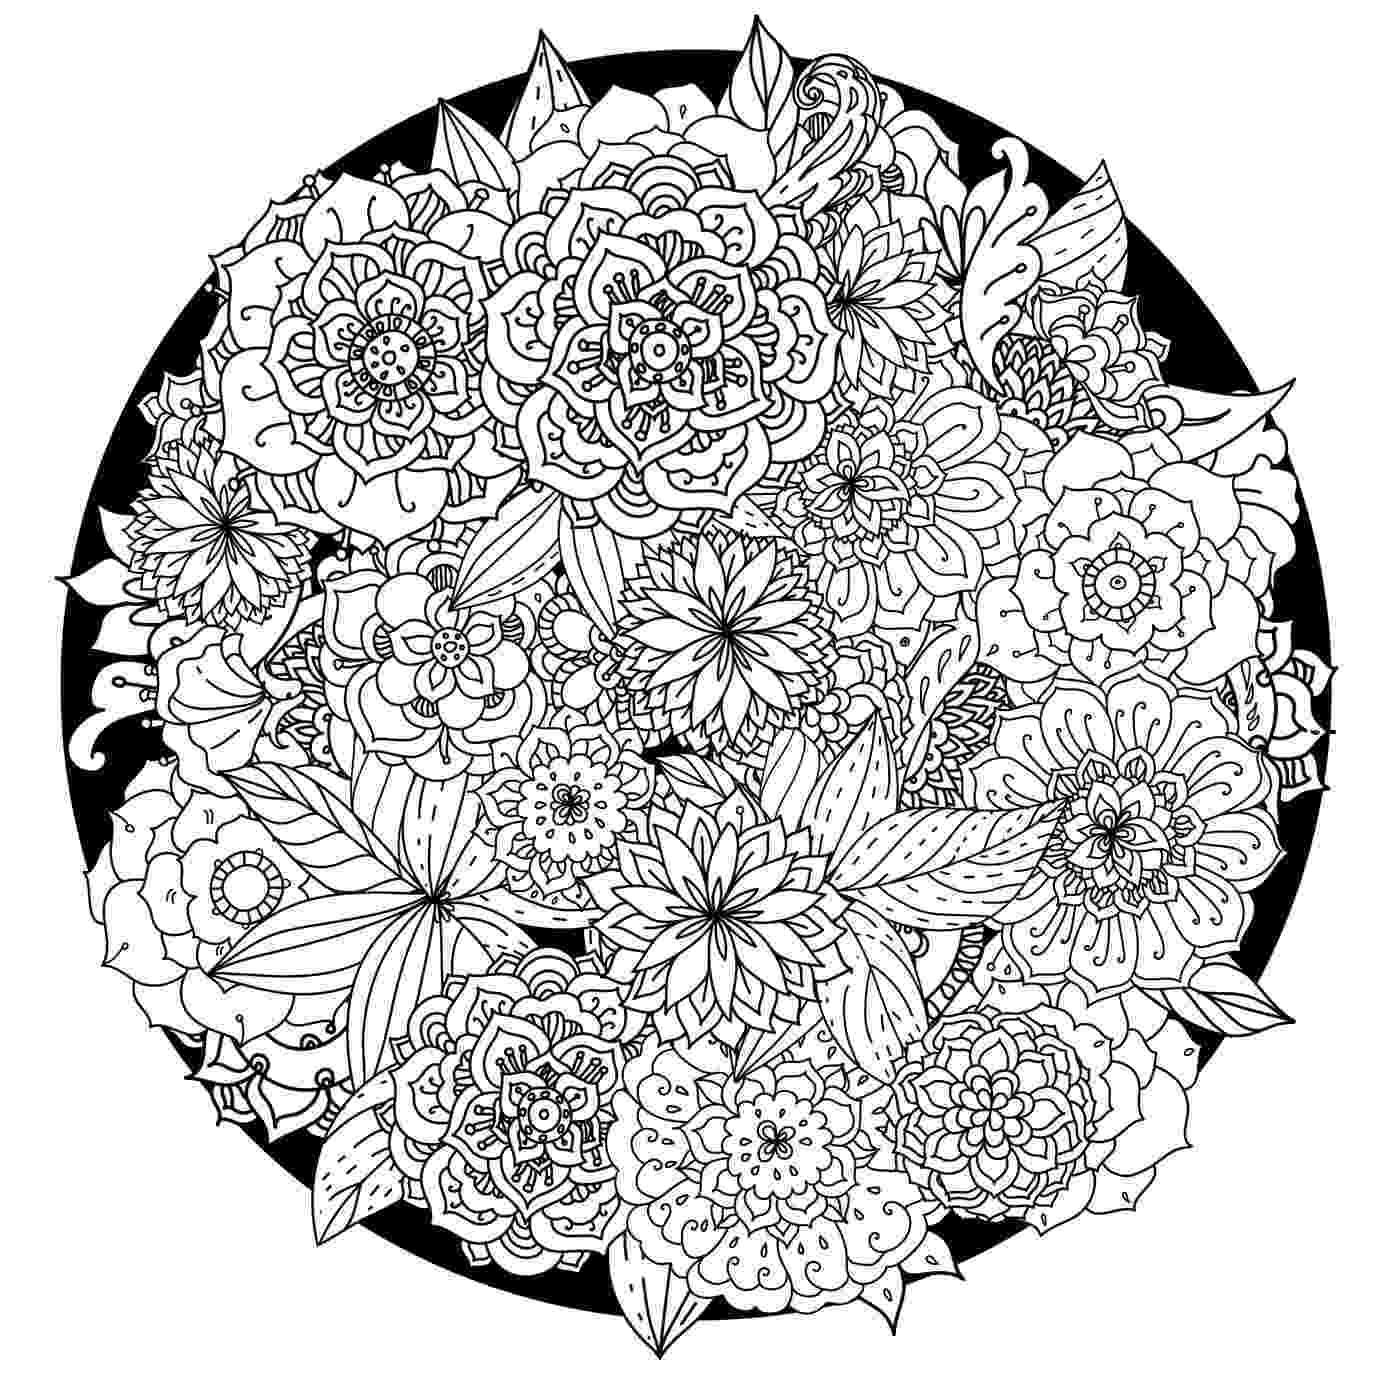 free mandela coloring pages mandala 17 coloring pages hellokidscom free mandela coloring pages